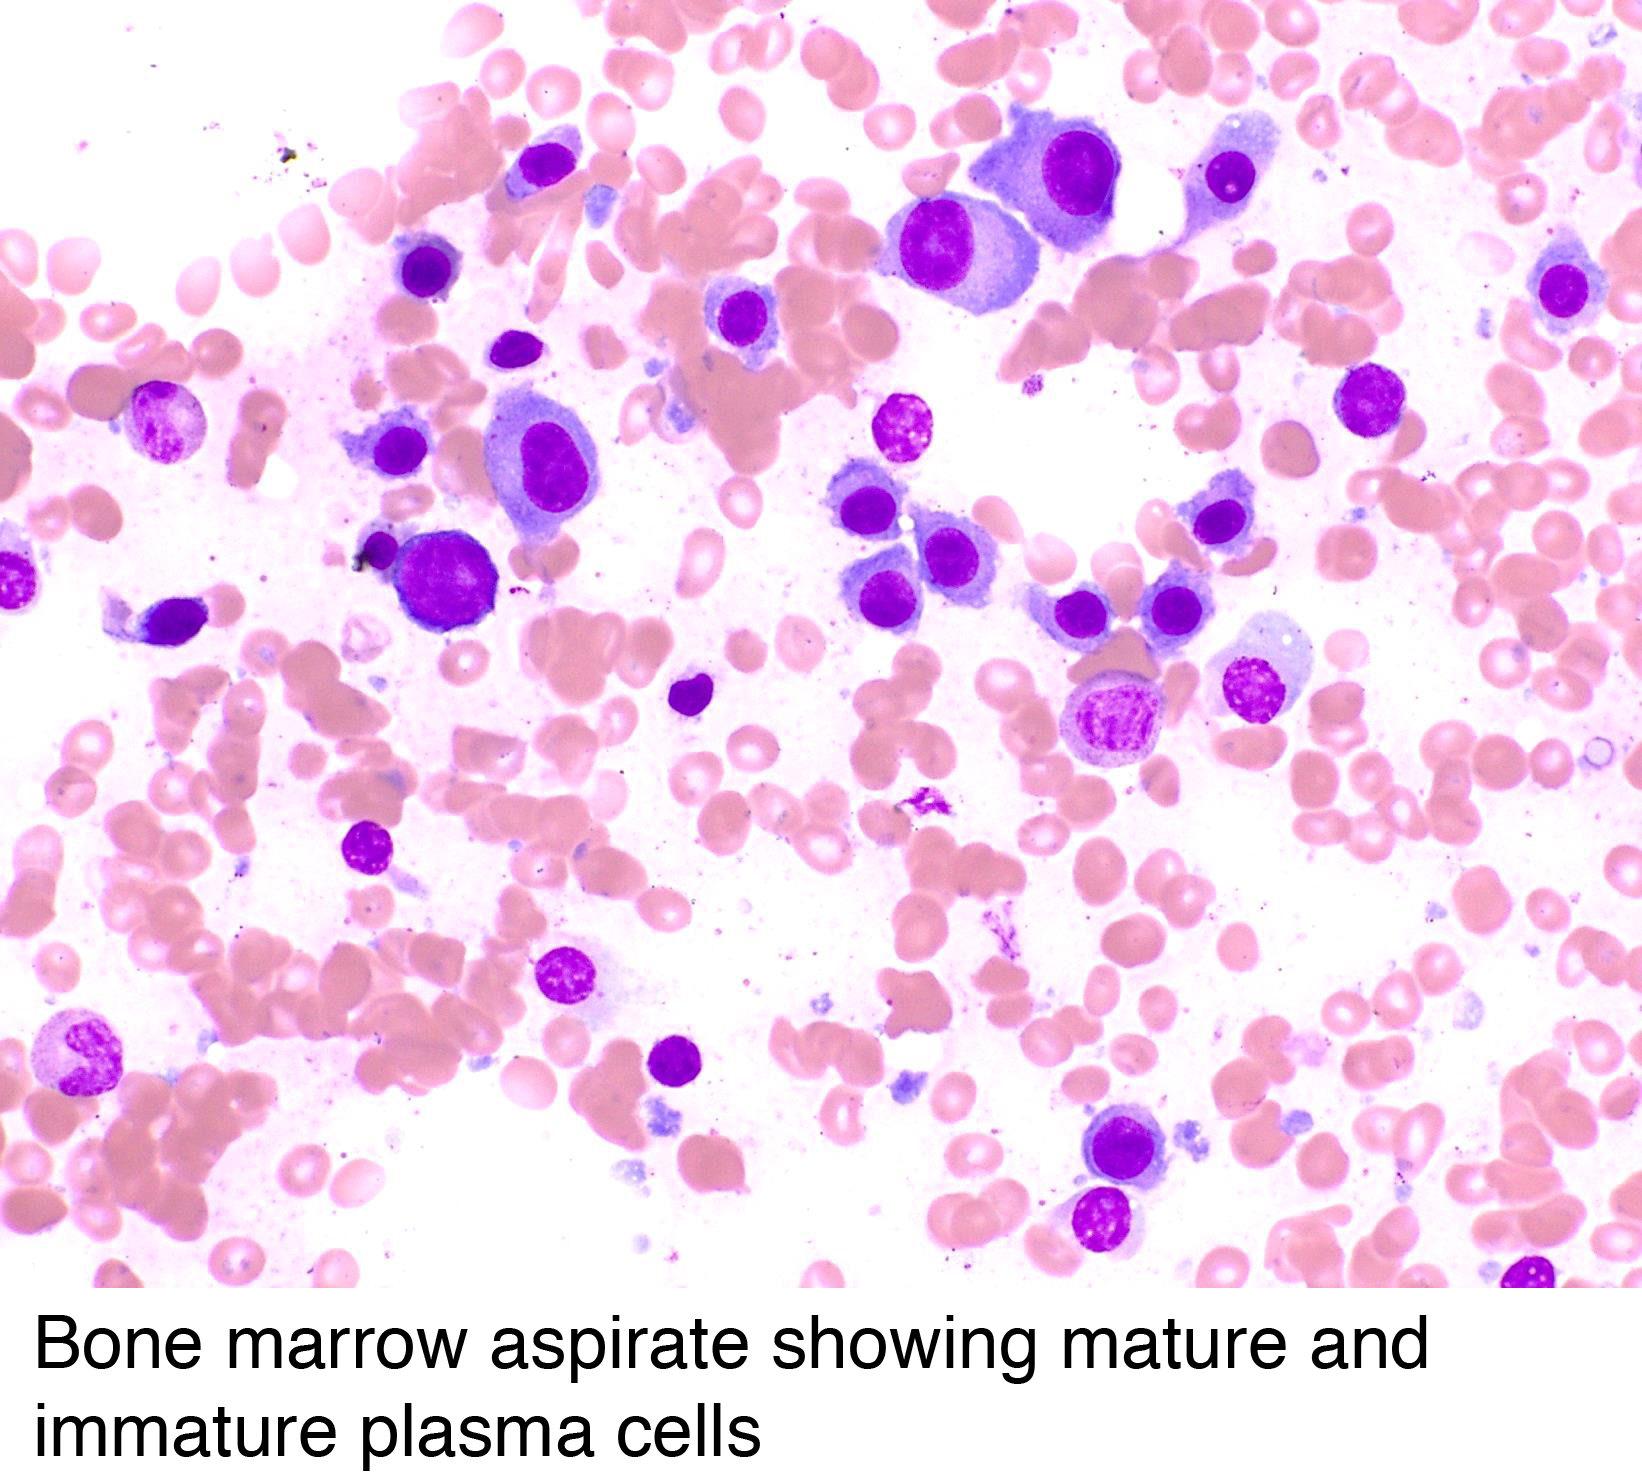 Bone marrow matures